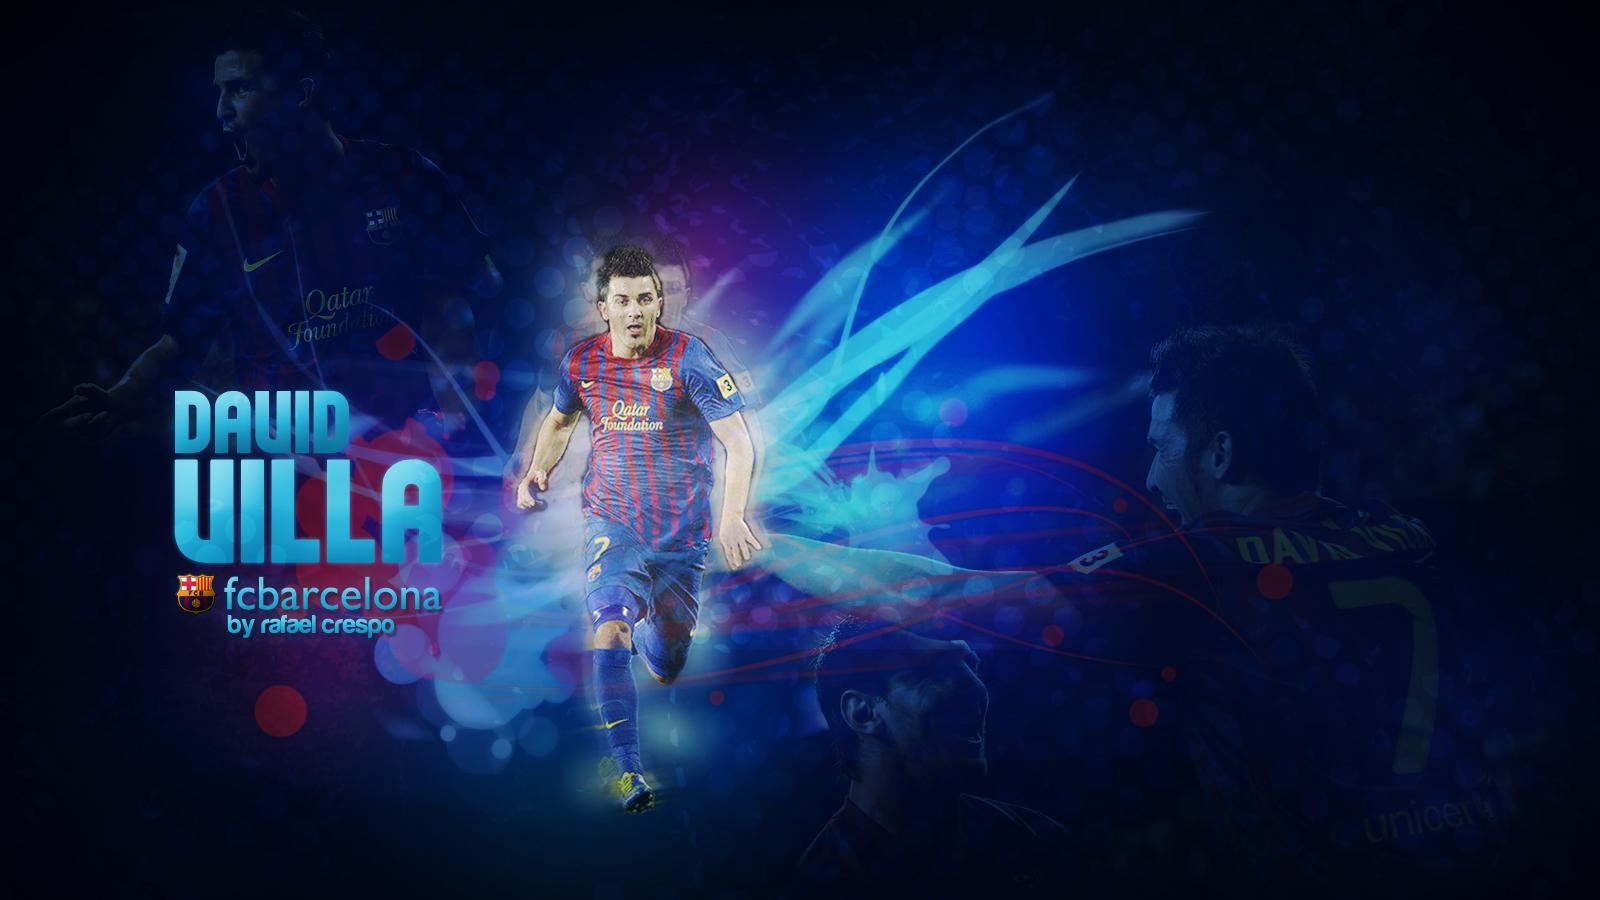 david villa wallpapers 2013 2014   FC Barcelona news 1600x900